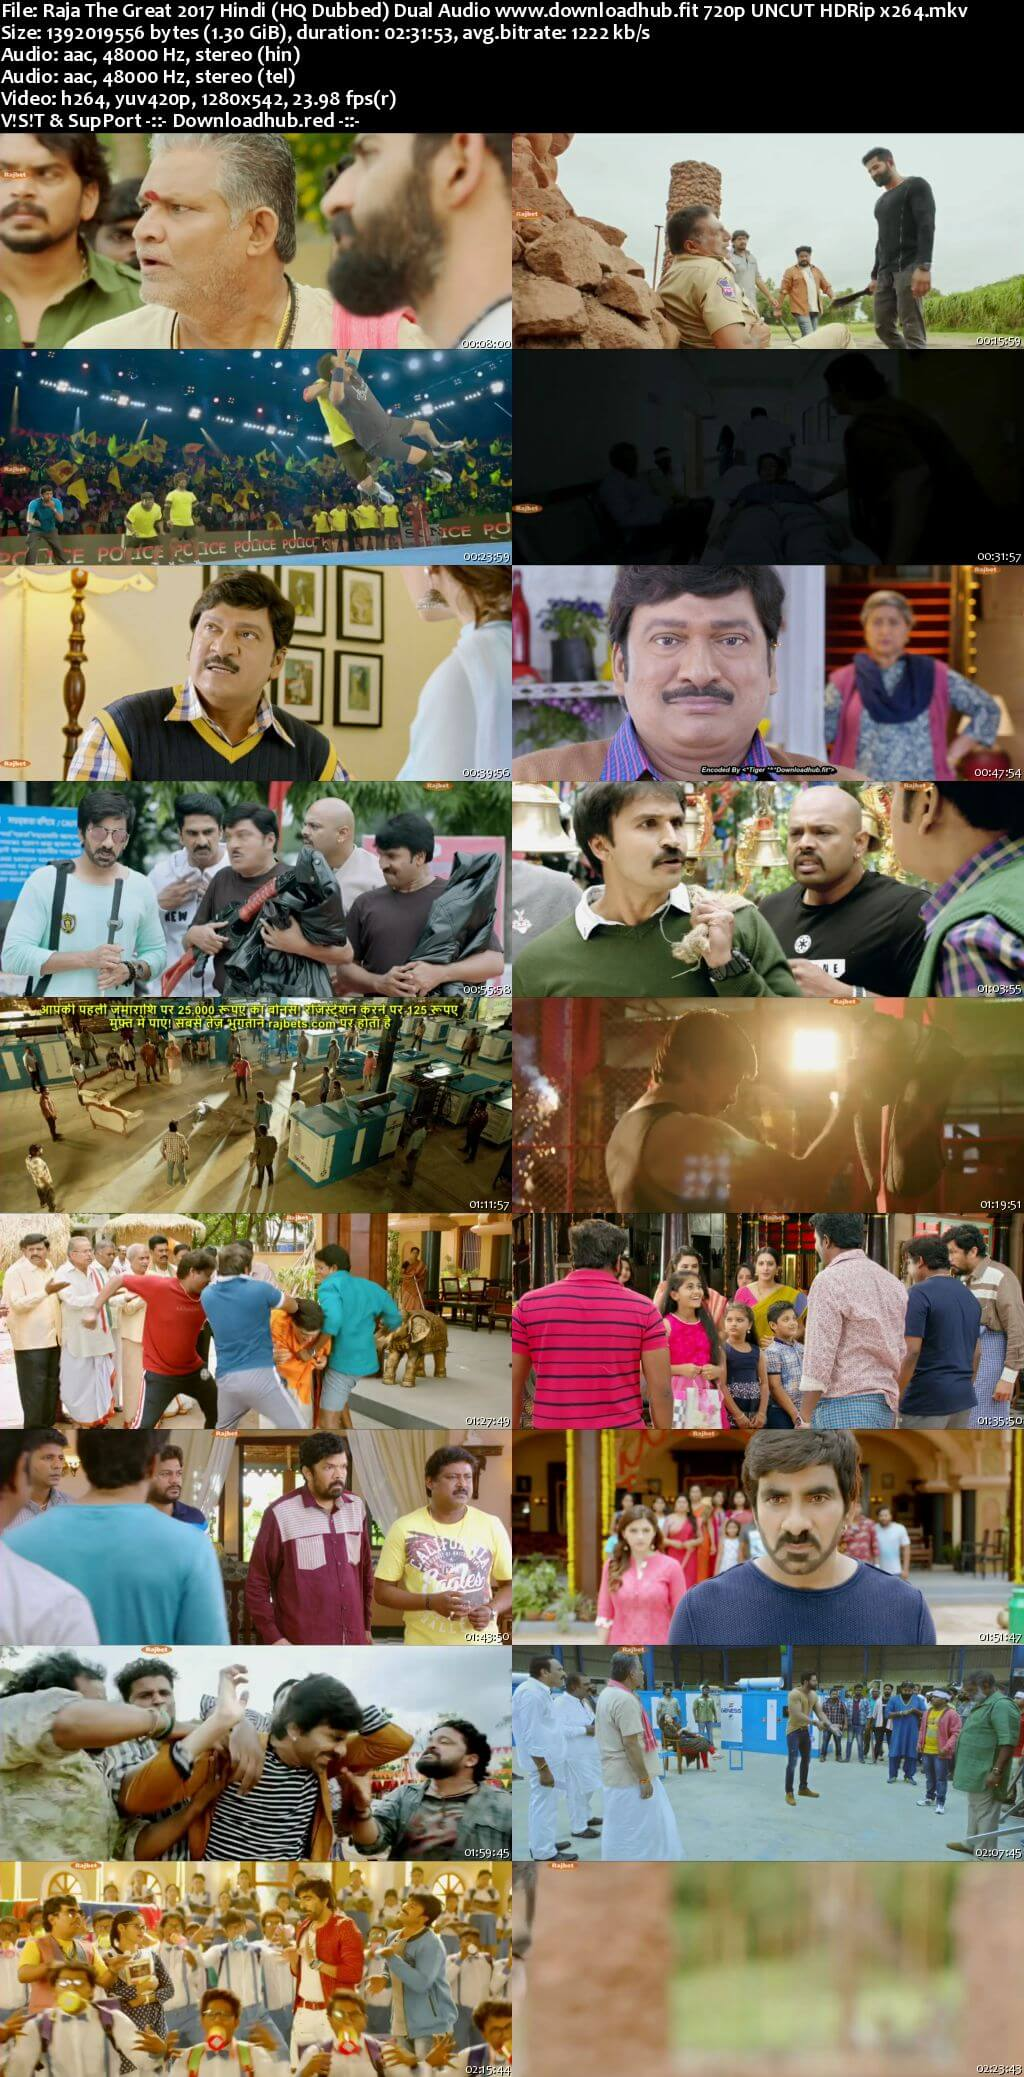 Raja The Great 2017 Hindi (HQ Dubbed) Dual Audio 720p 480p UNCUT HDRip x264